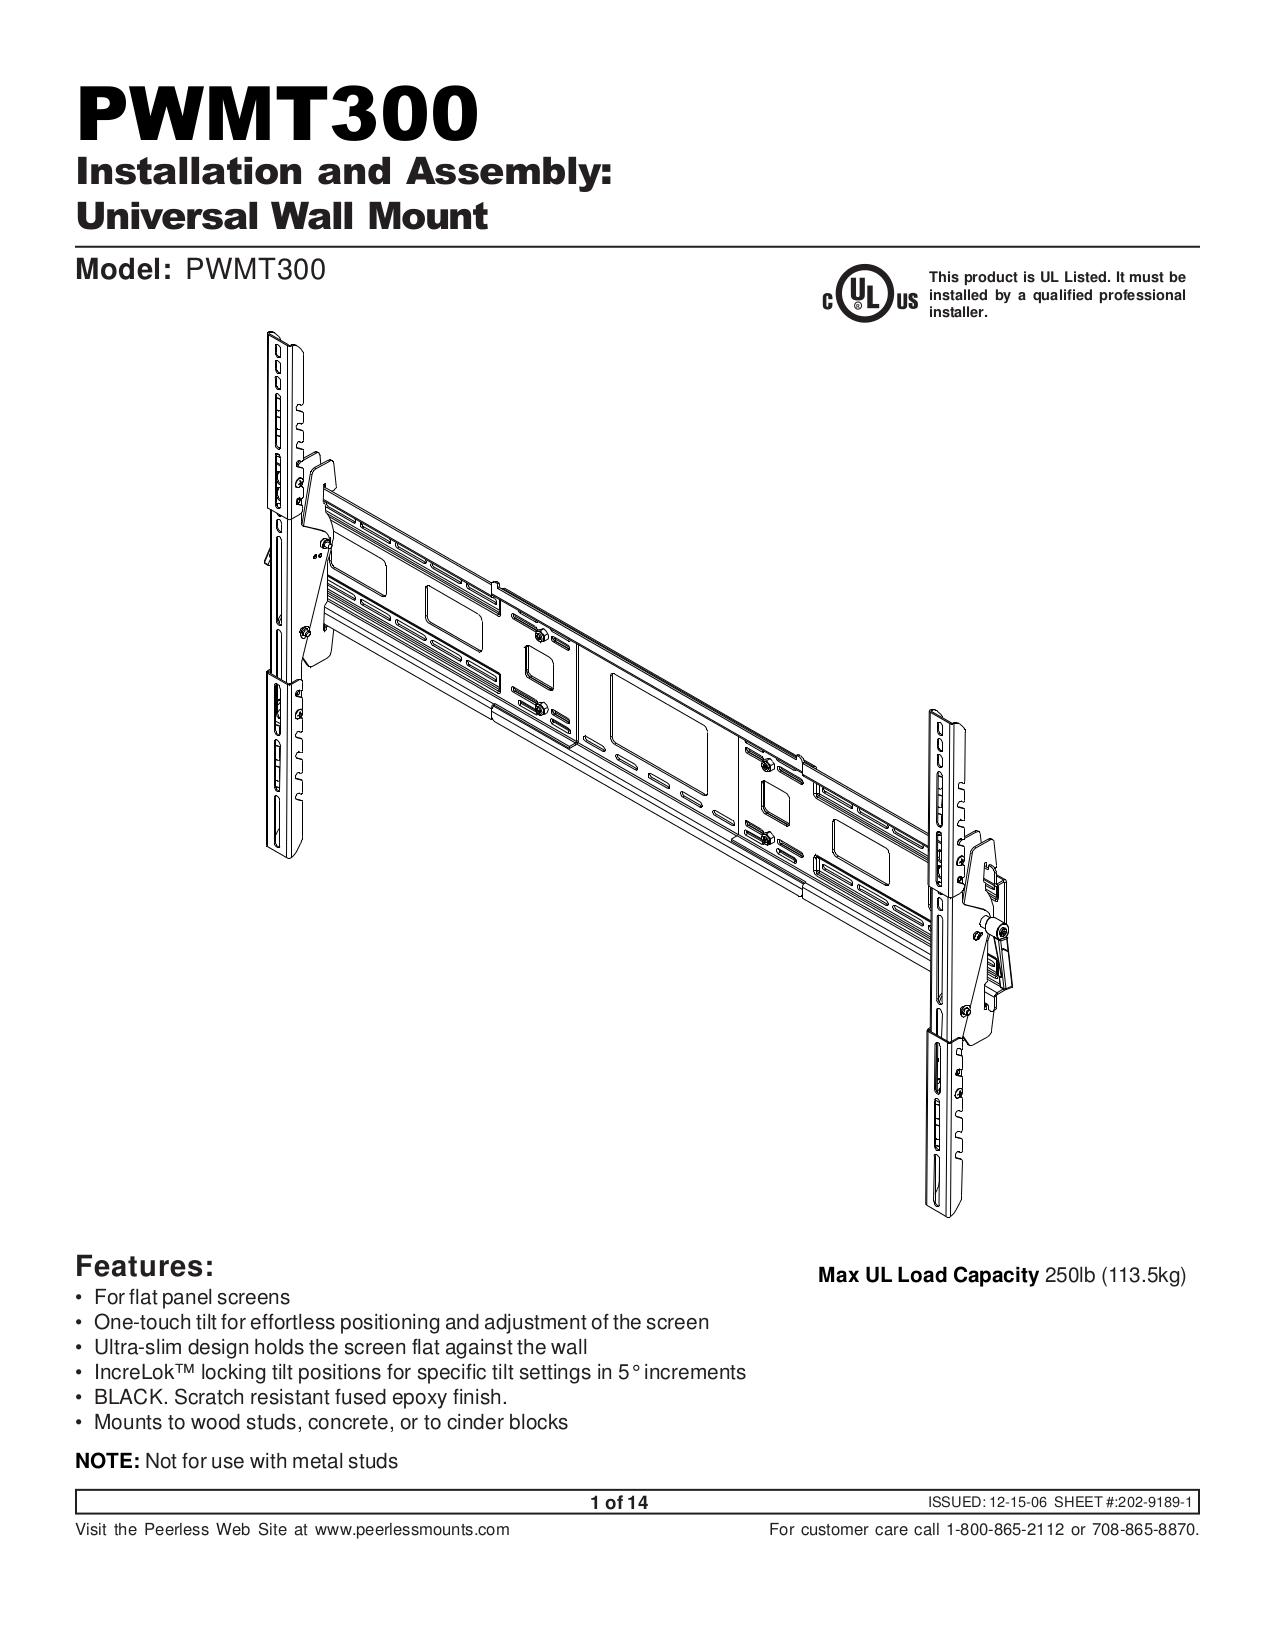 pdf for LG TV RU-42PX10 manual